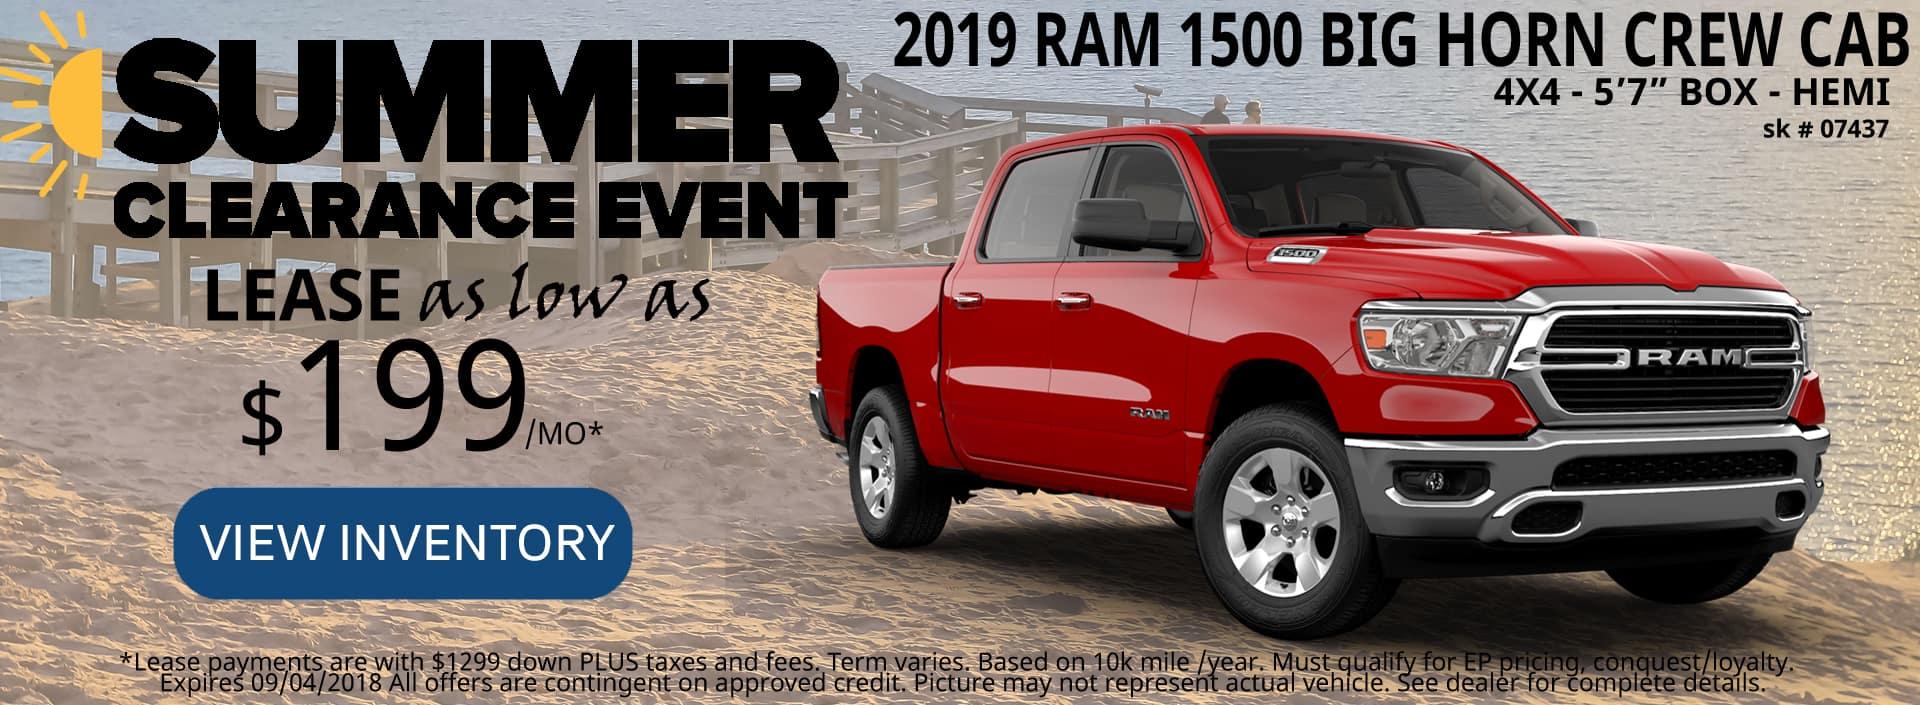 August 2018 Special 2019 1500 Ram Big Horn 4x4